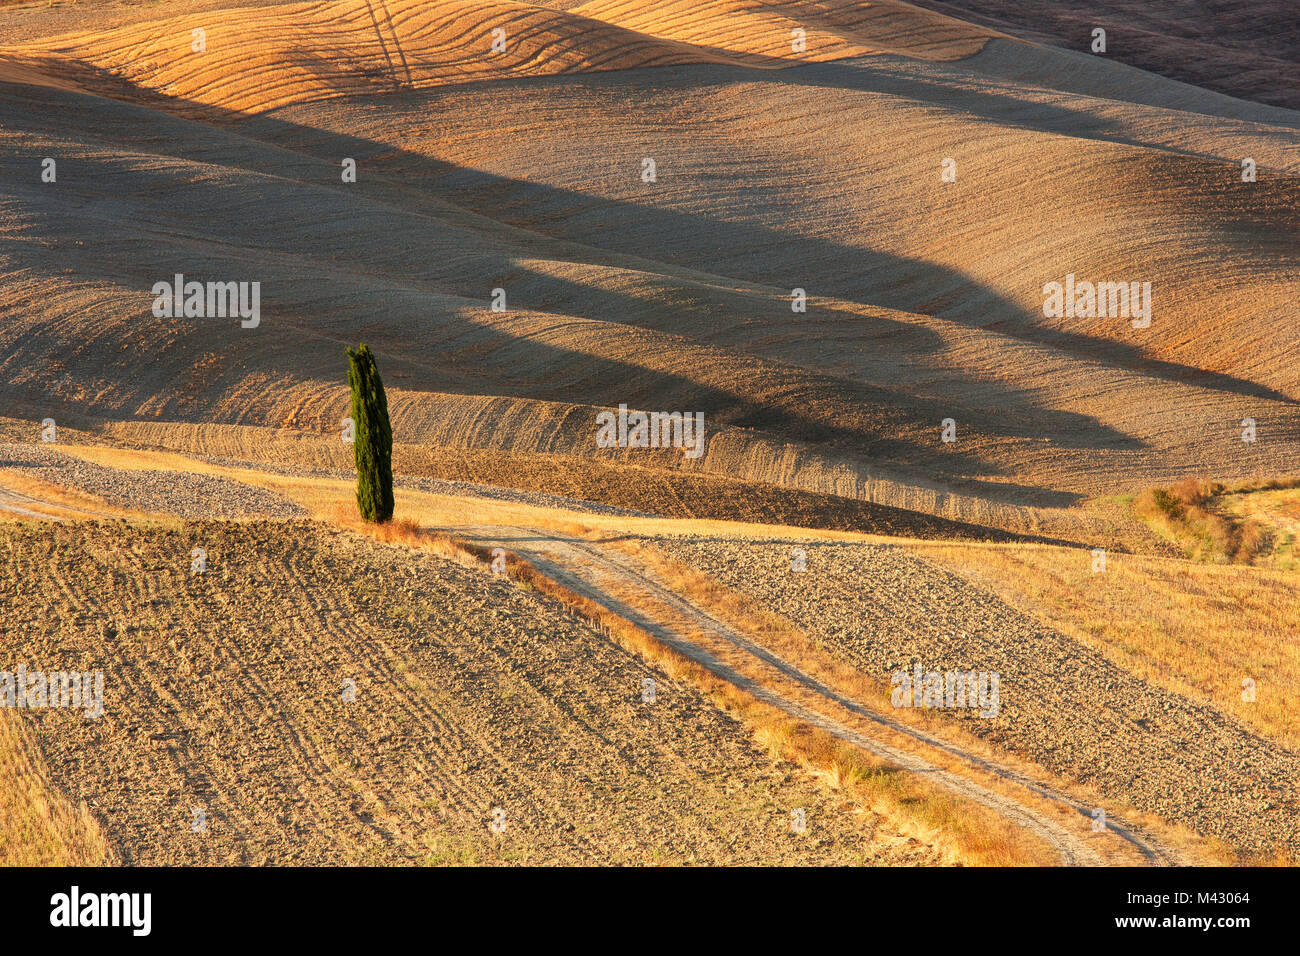 Europa, Italia, Toscana, Siena,distrito Valle de Orcia. Foto de stock